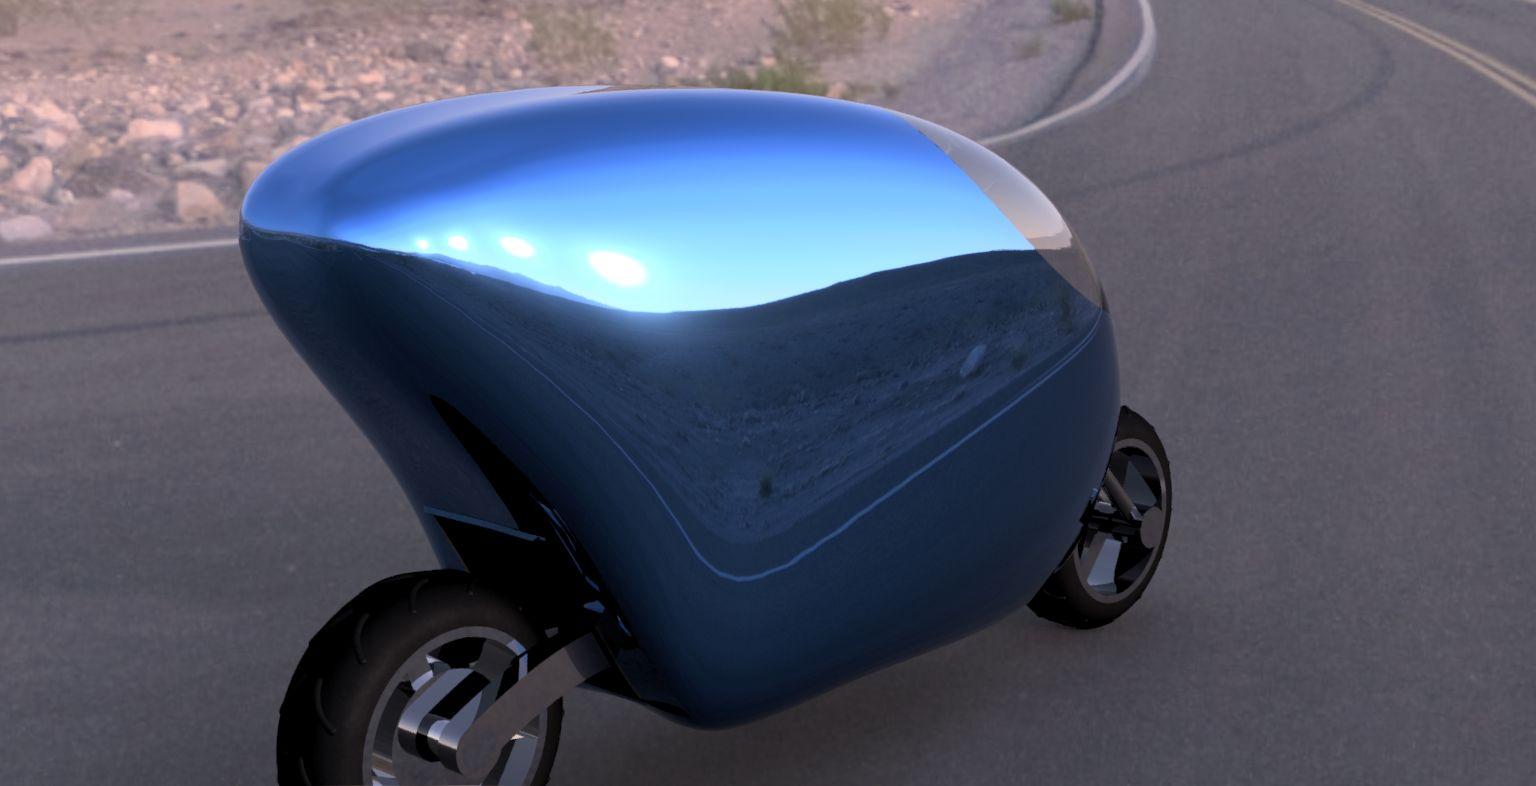 Self-balance-smart-bike-assembled-v14-3500-3500